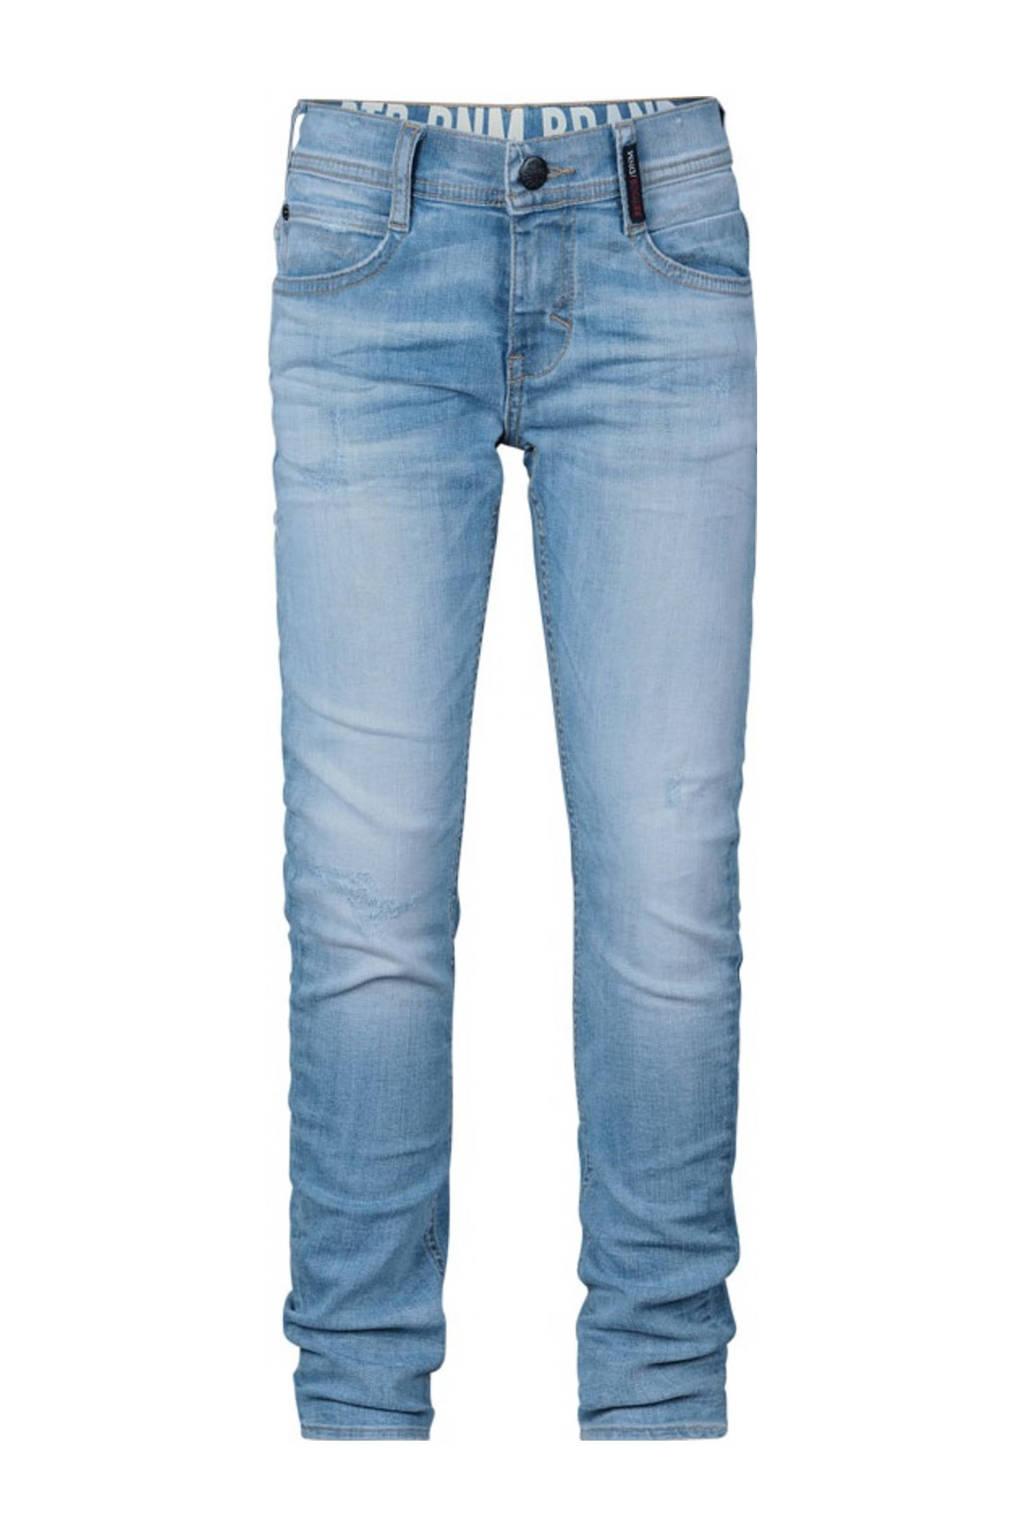 Retour Denim regular fit jeans Tobias light blue denim, Light blue denim